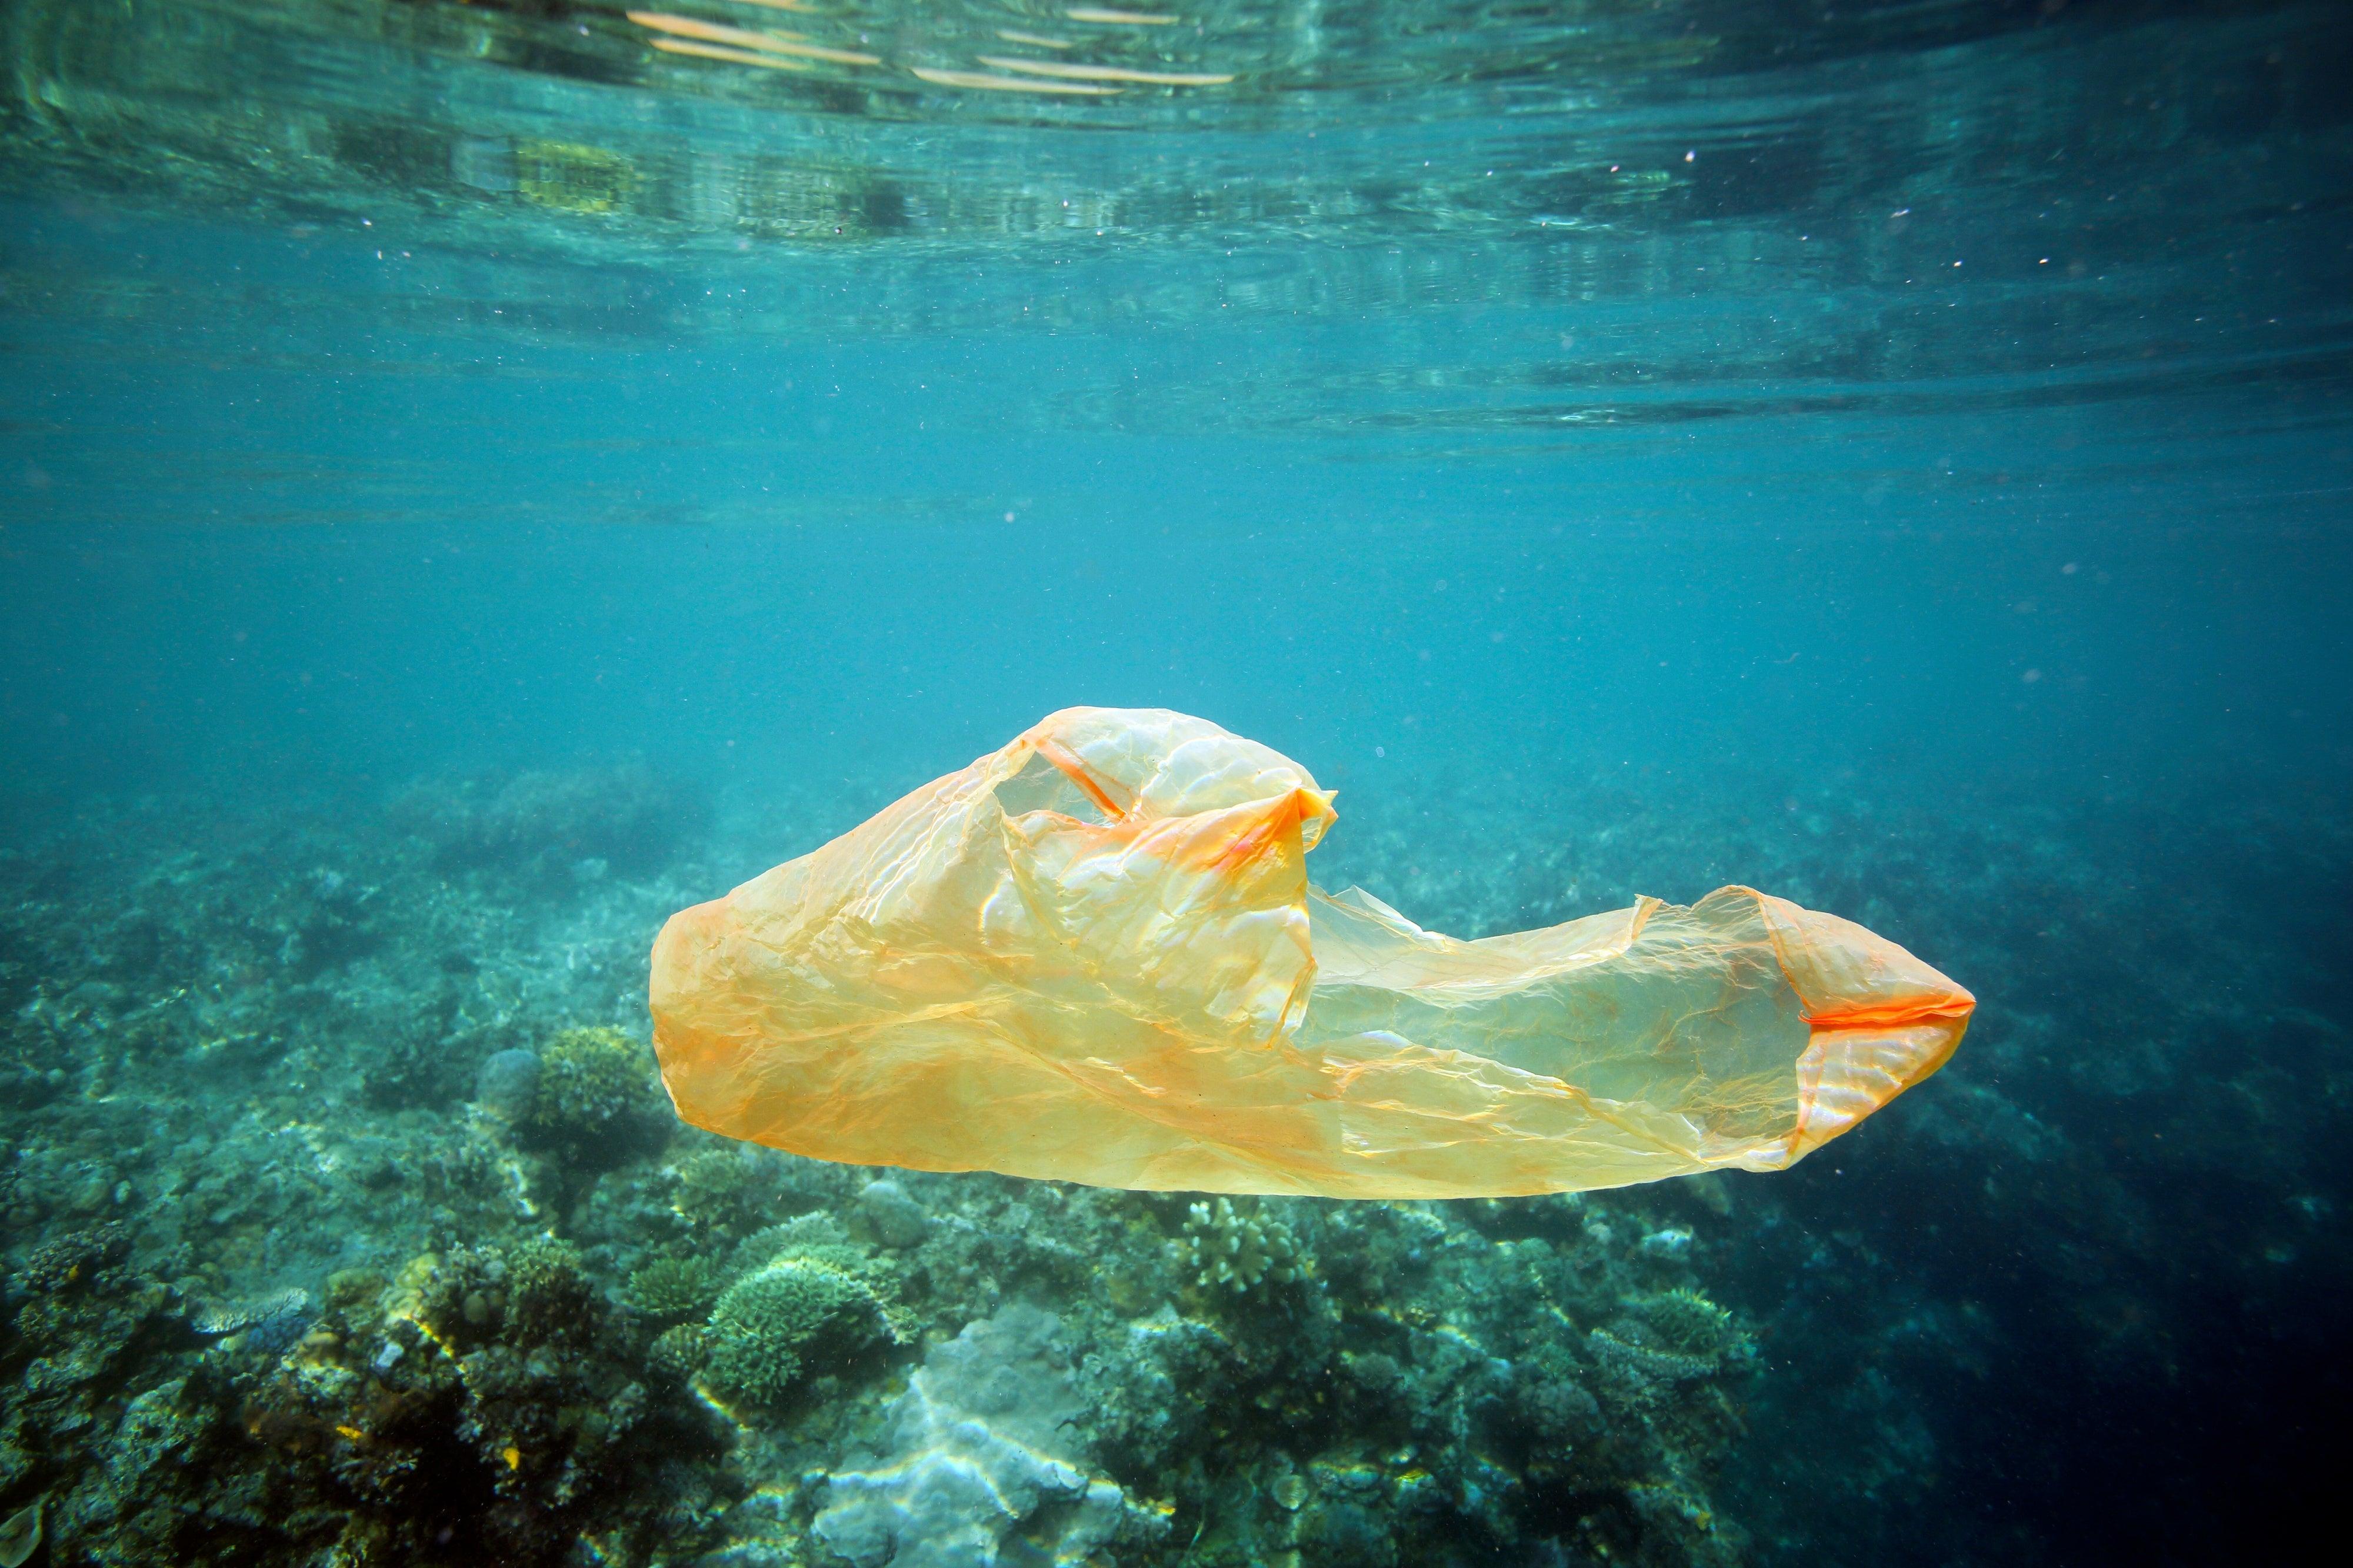 Where Plastic Goes, Coral Disease Follows - Scientific American